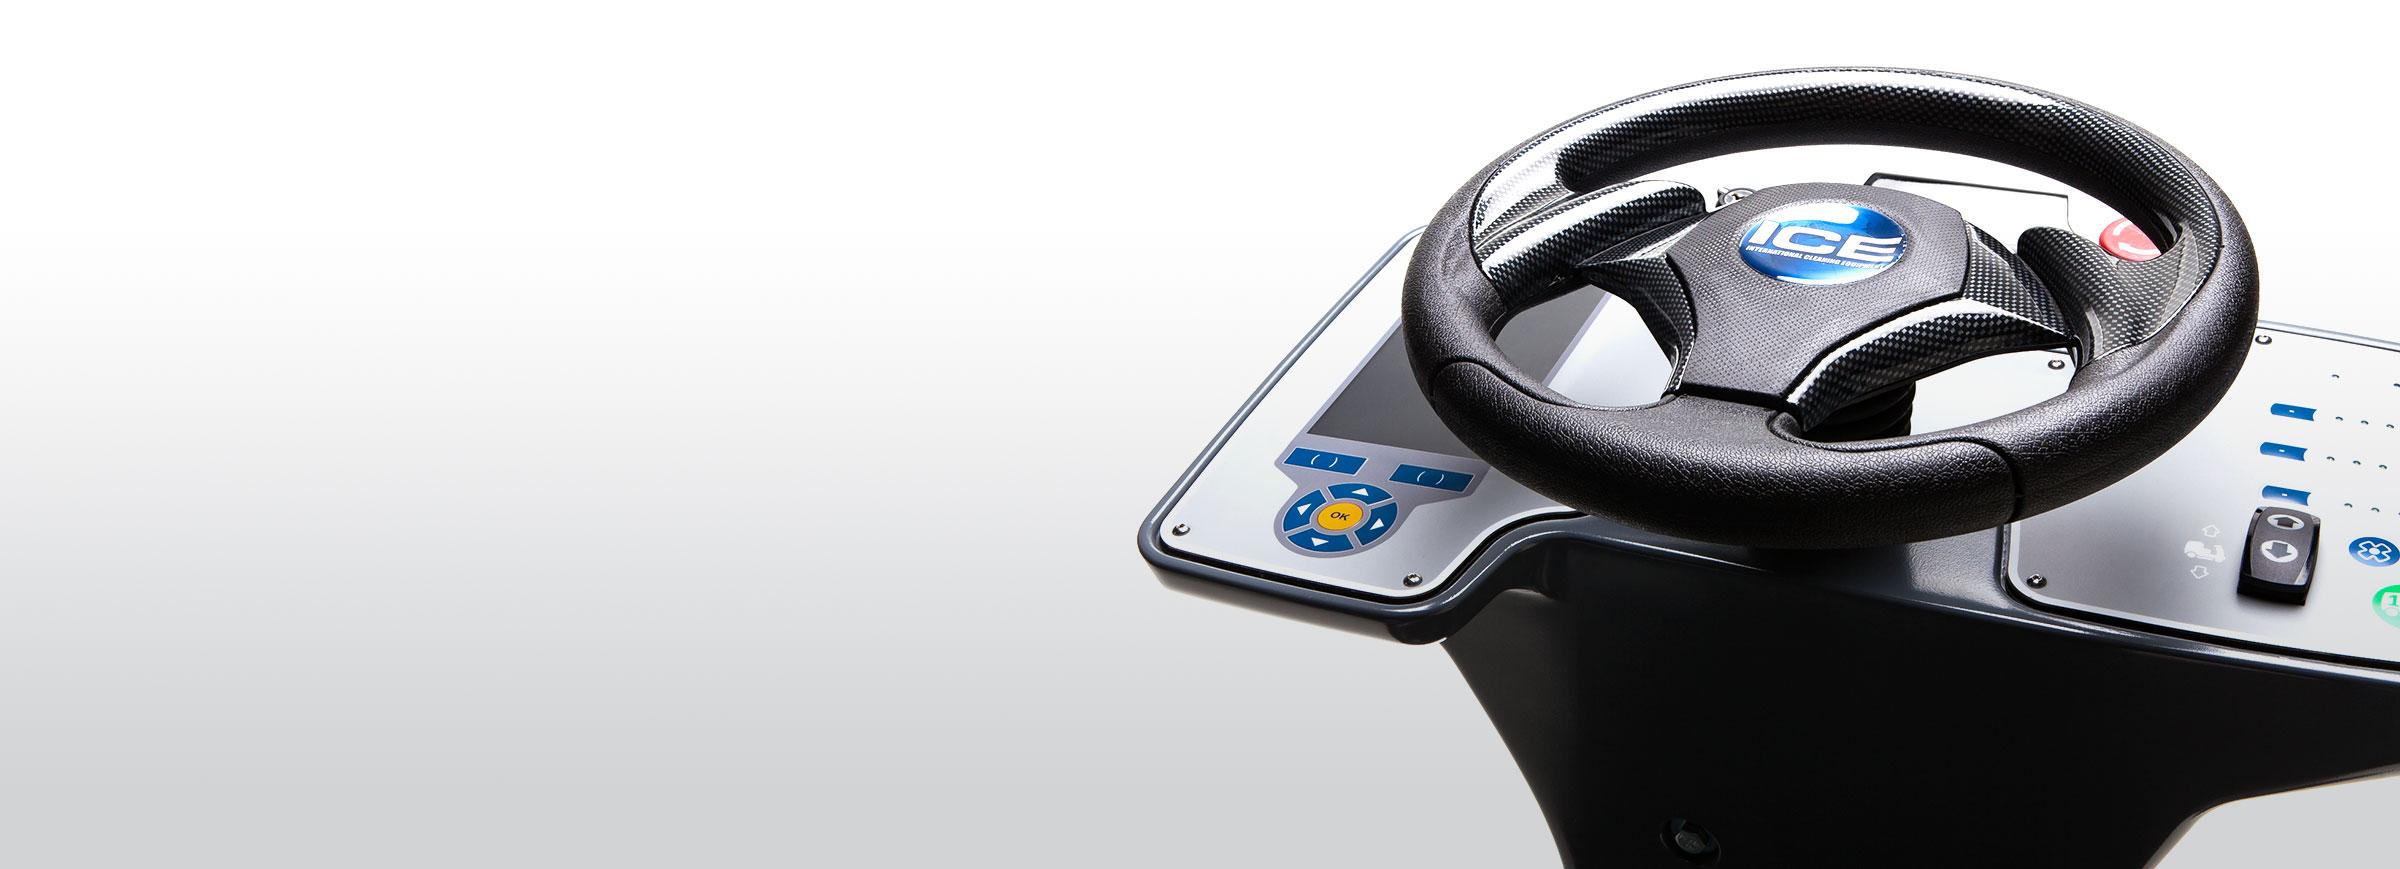 autonomous floor cleaner